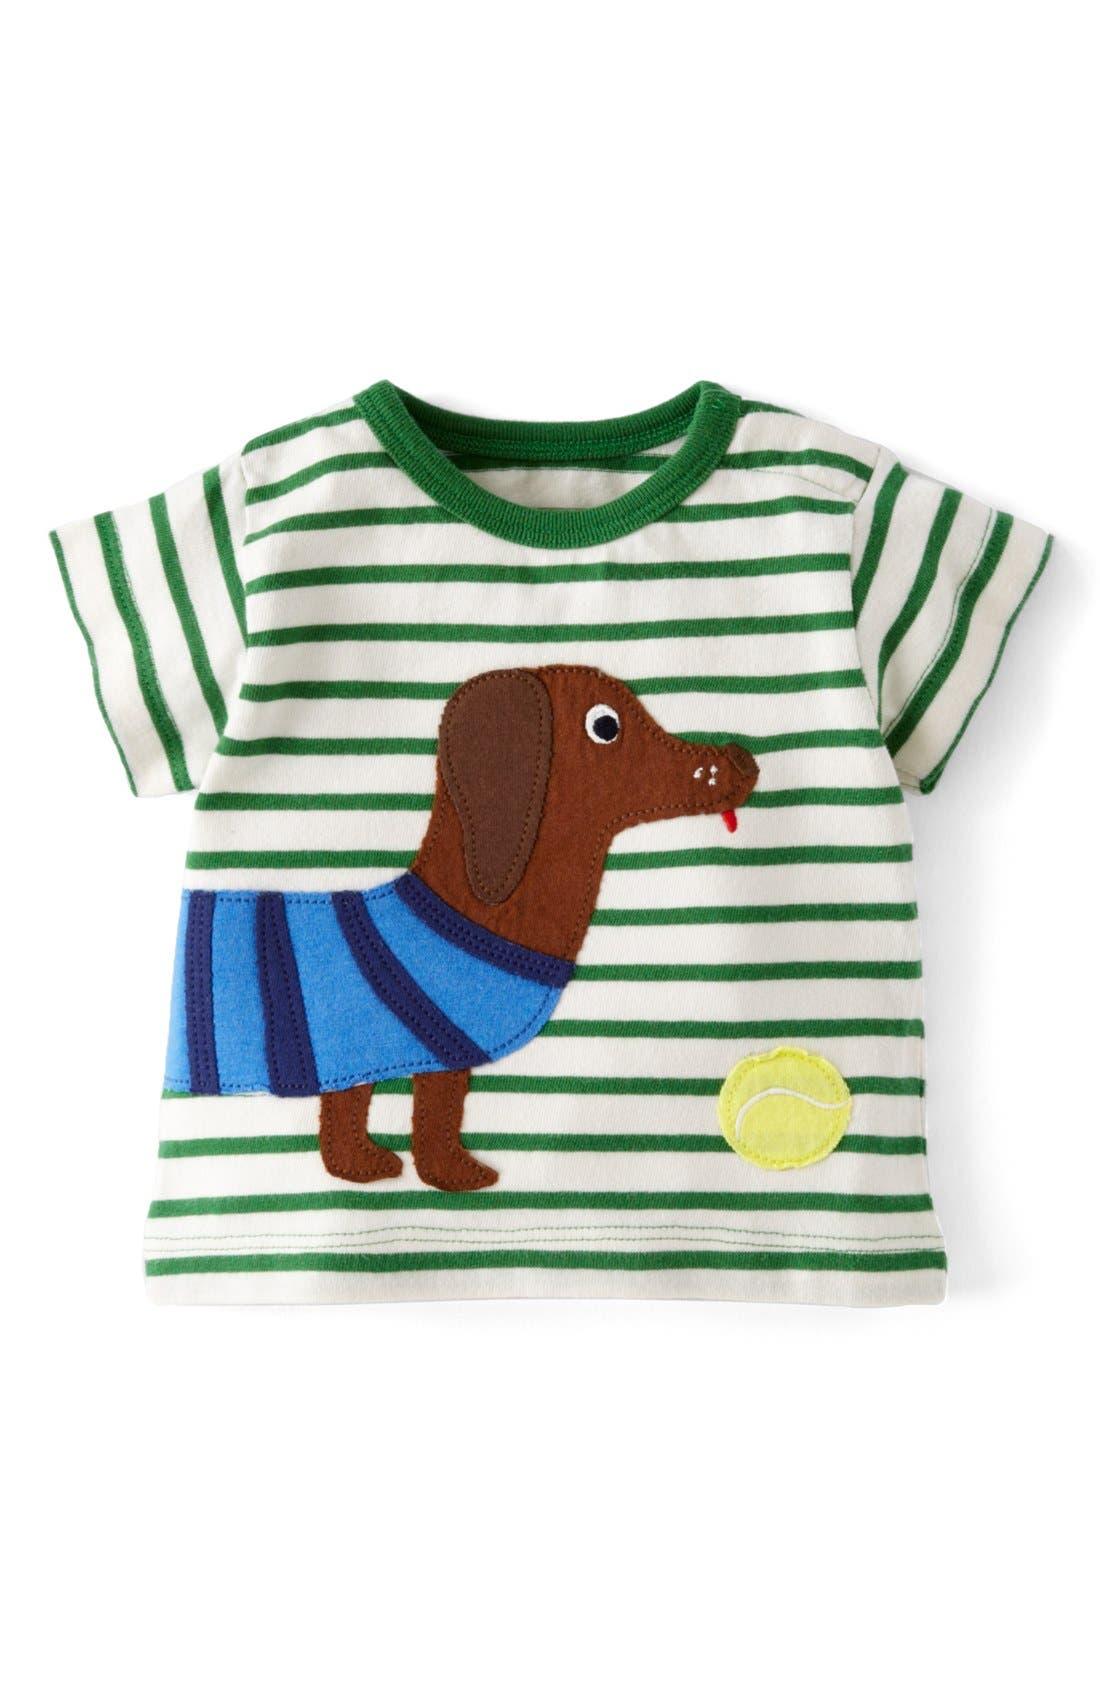 Main Image - Mini Boden 'Seaside' Cotton T-Shirt (Baby Boys)